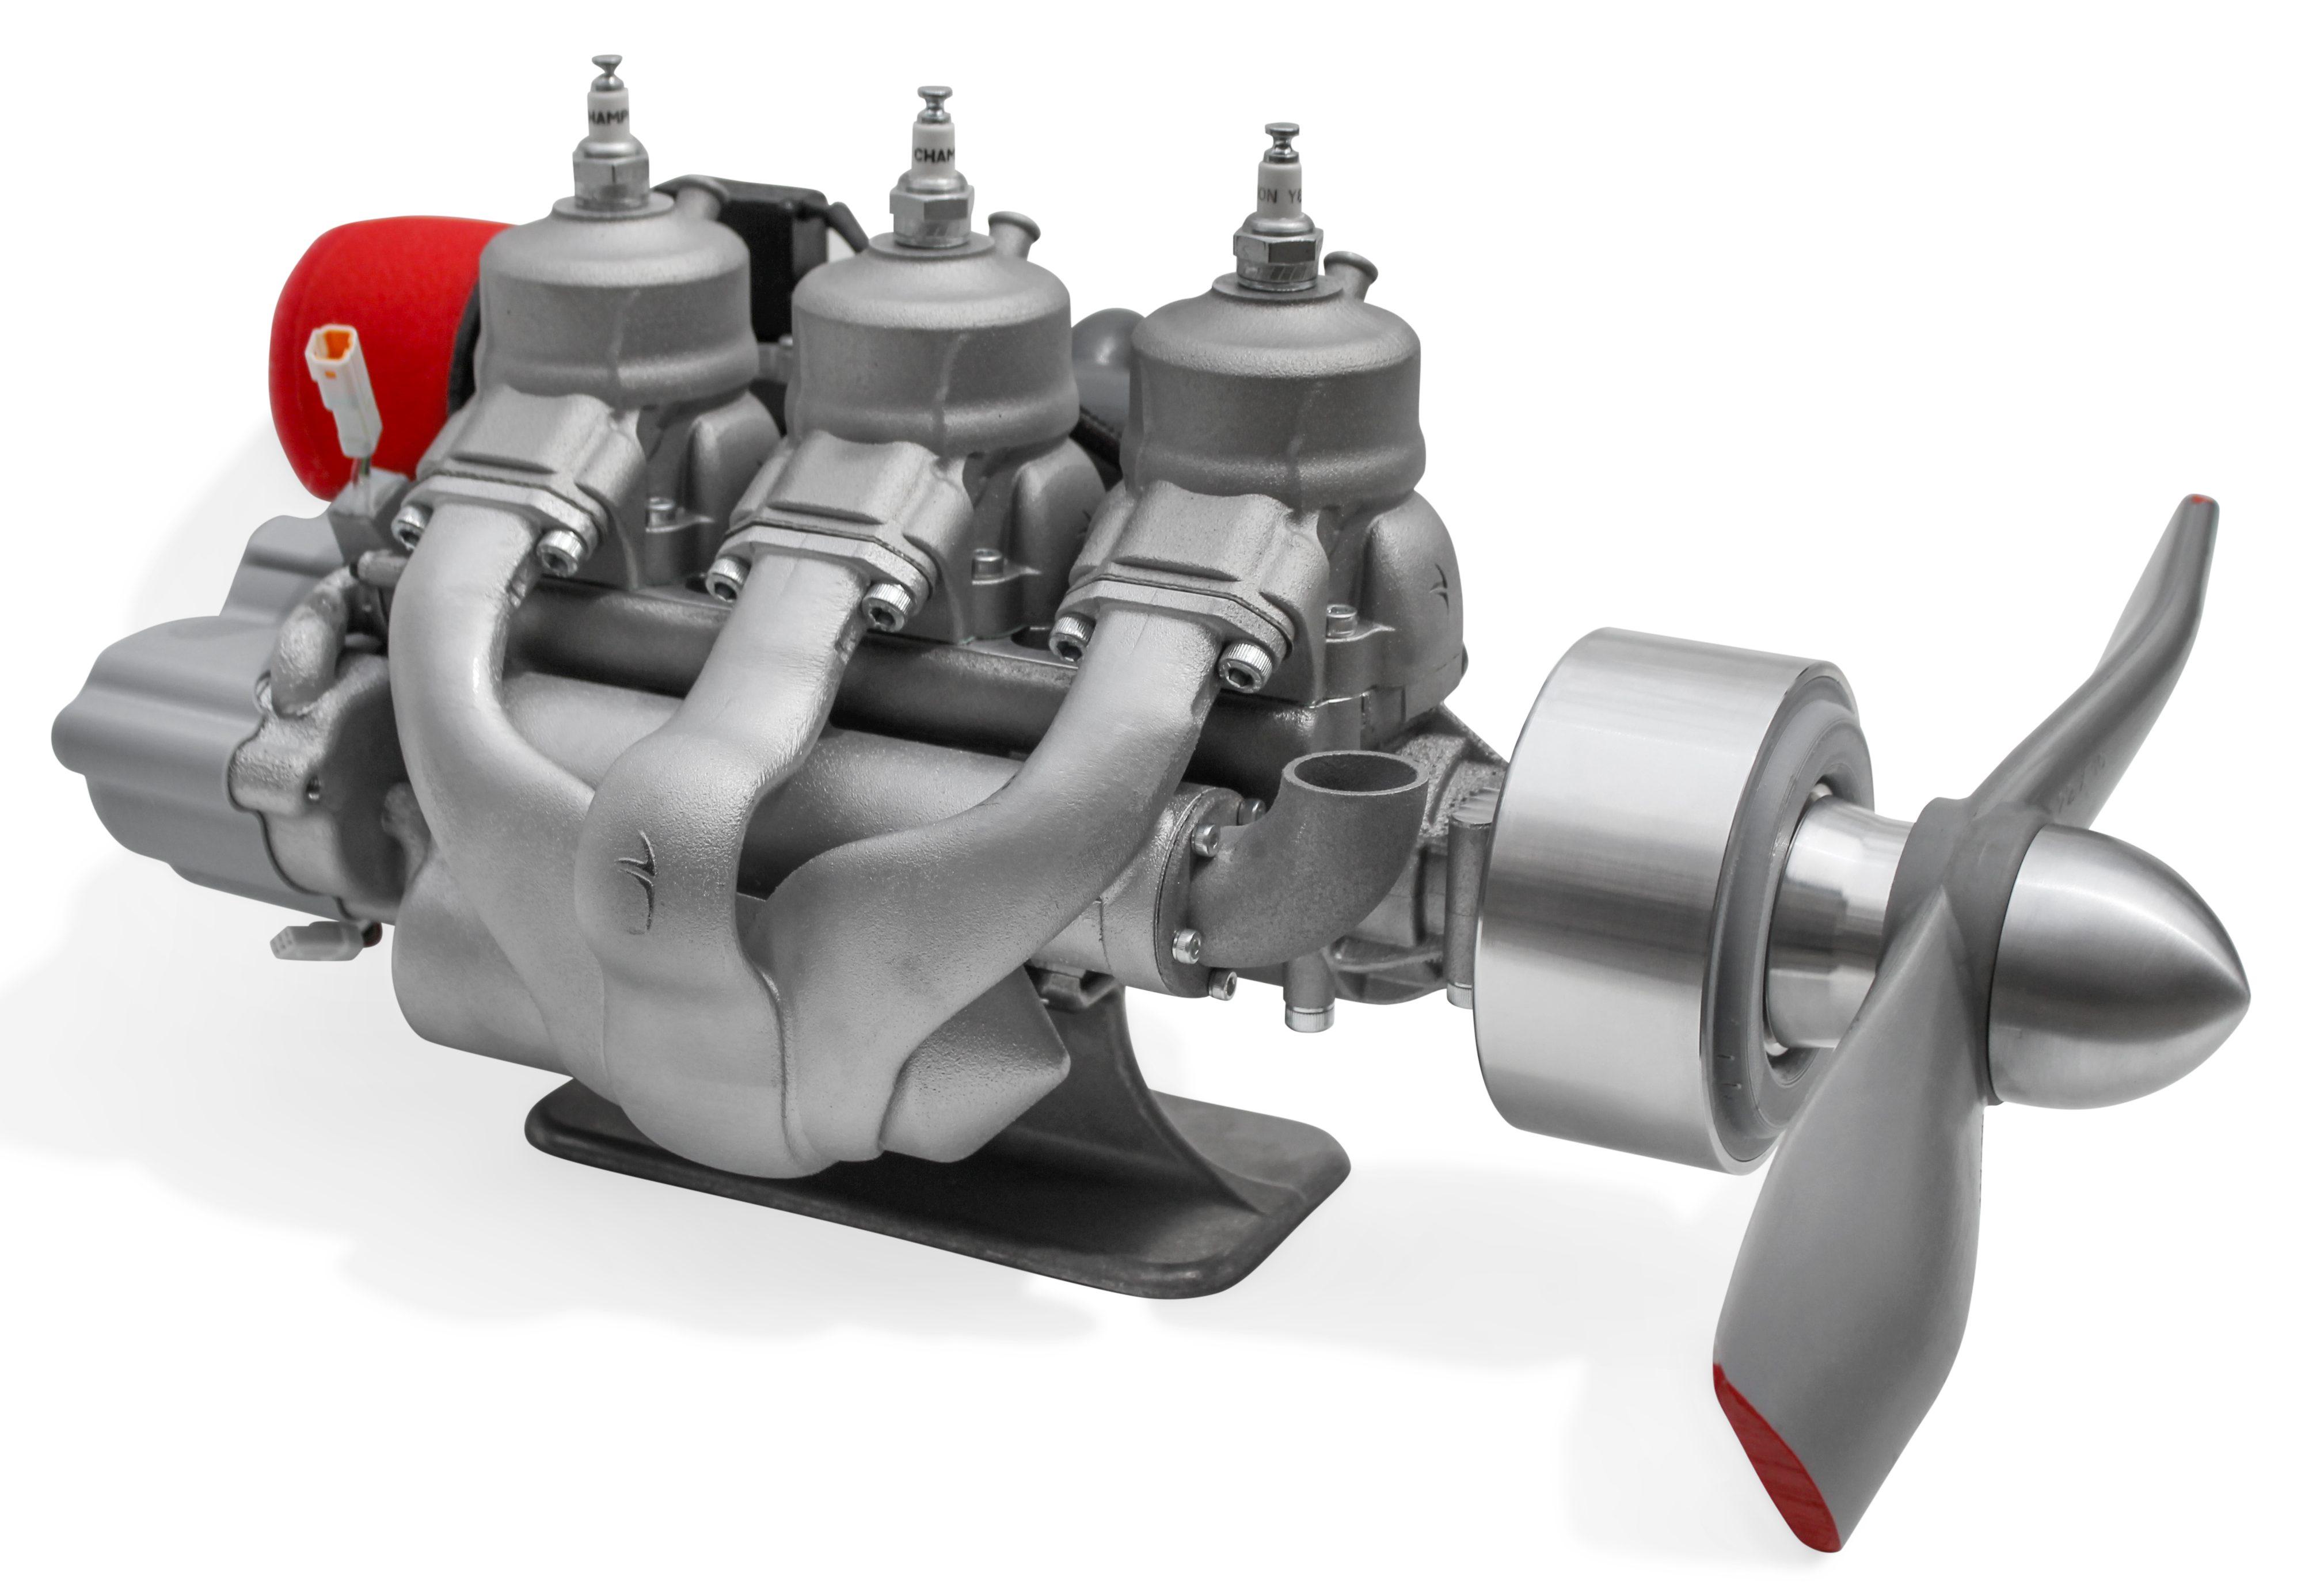 A99 Triple Liquid Cooled UAV Engine